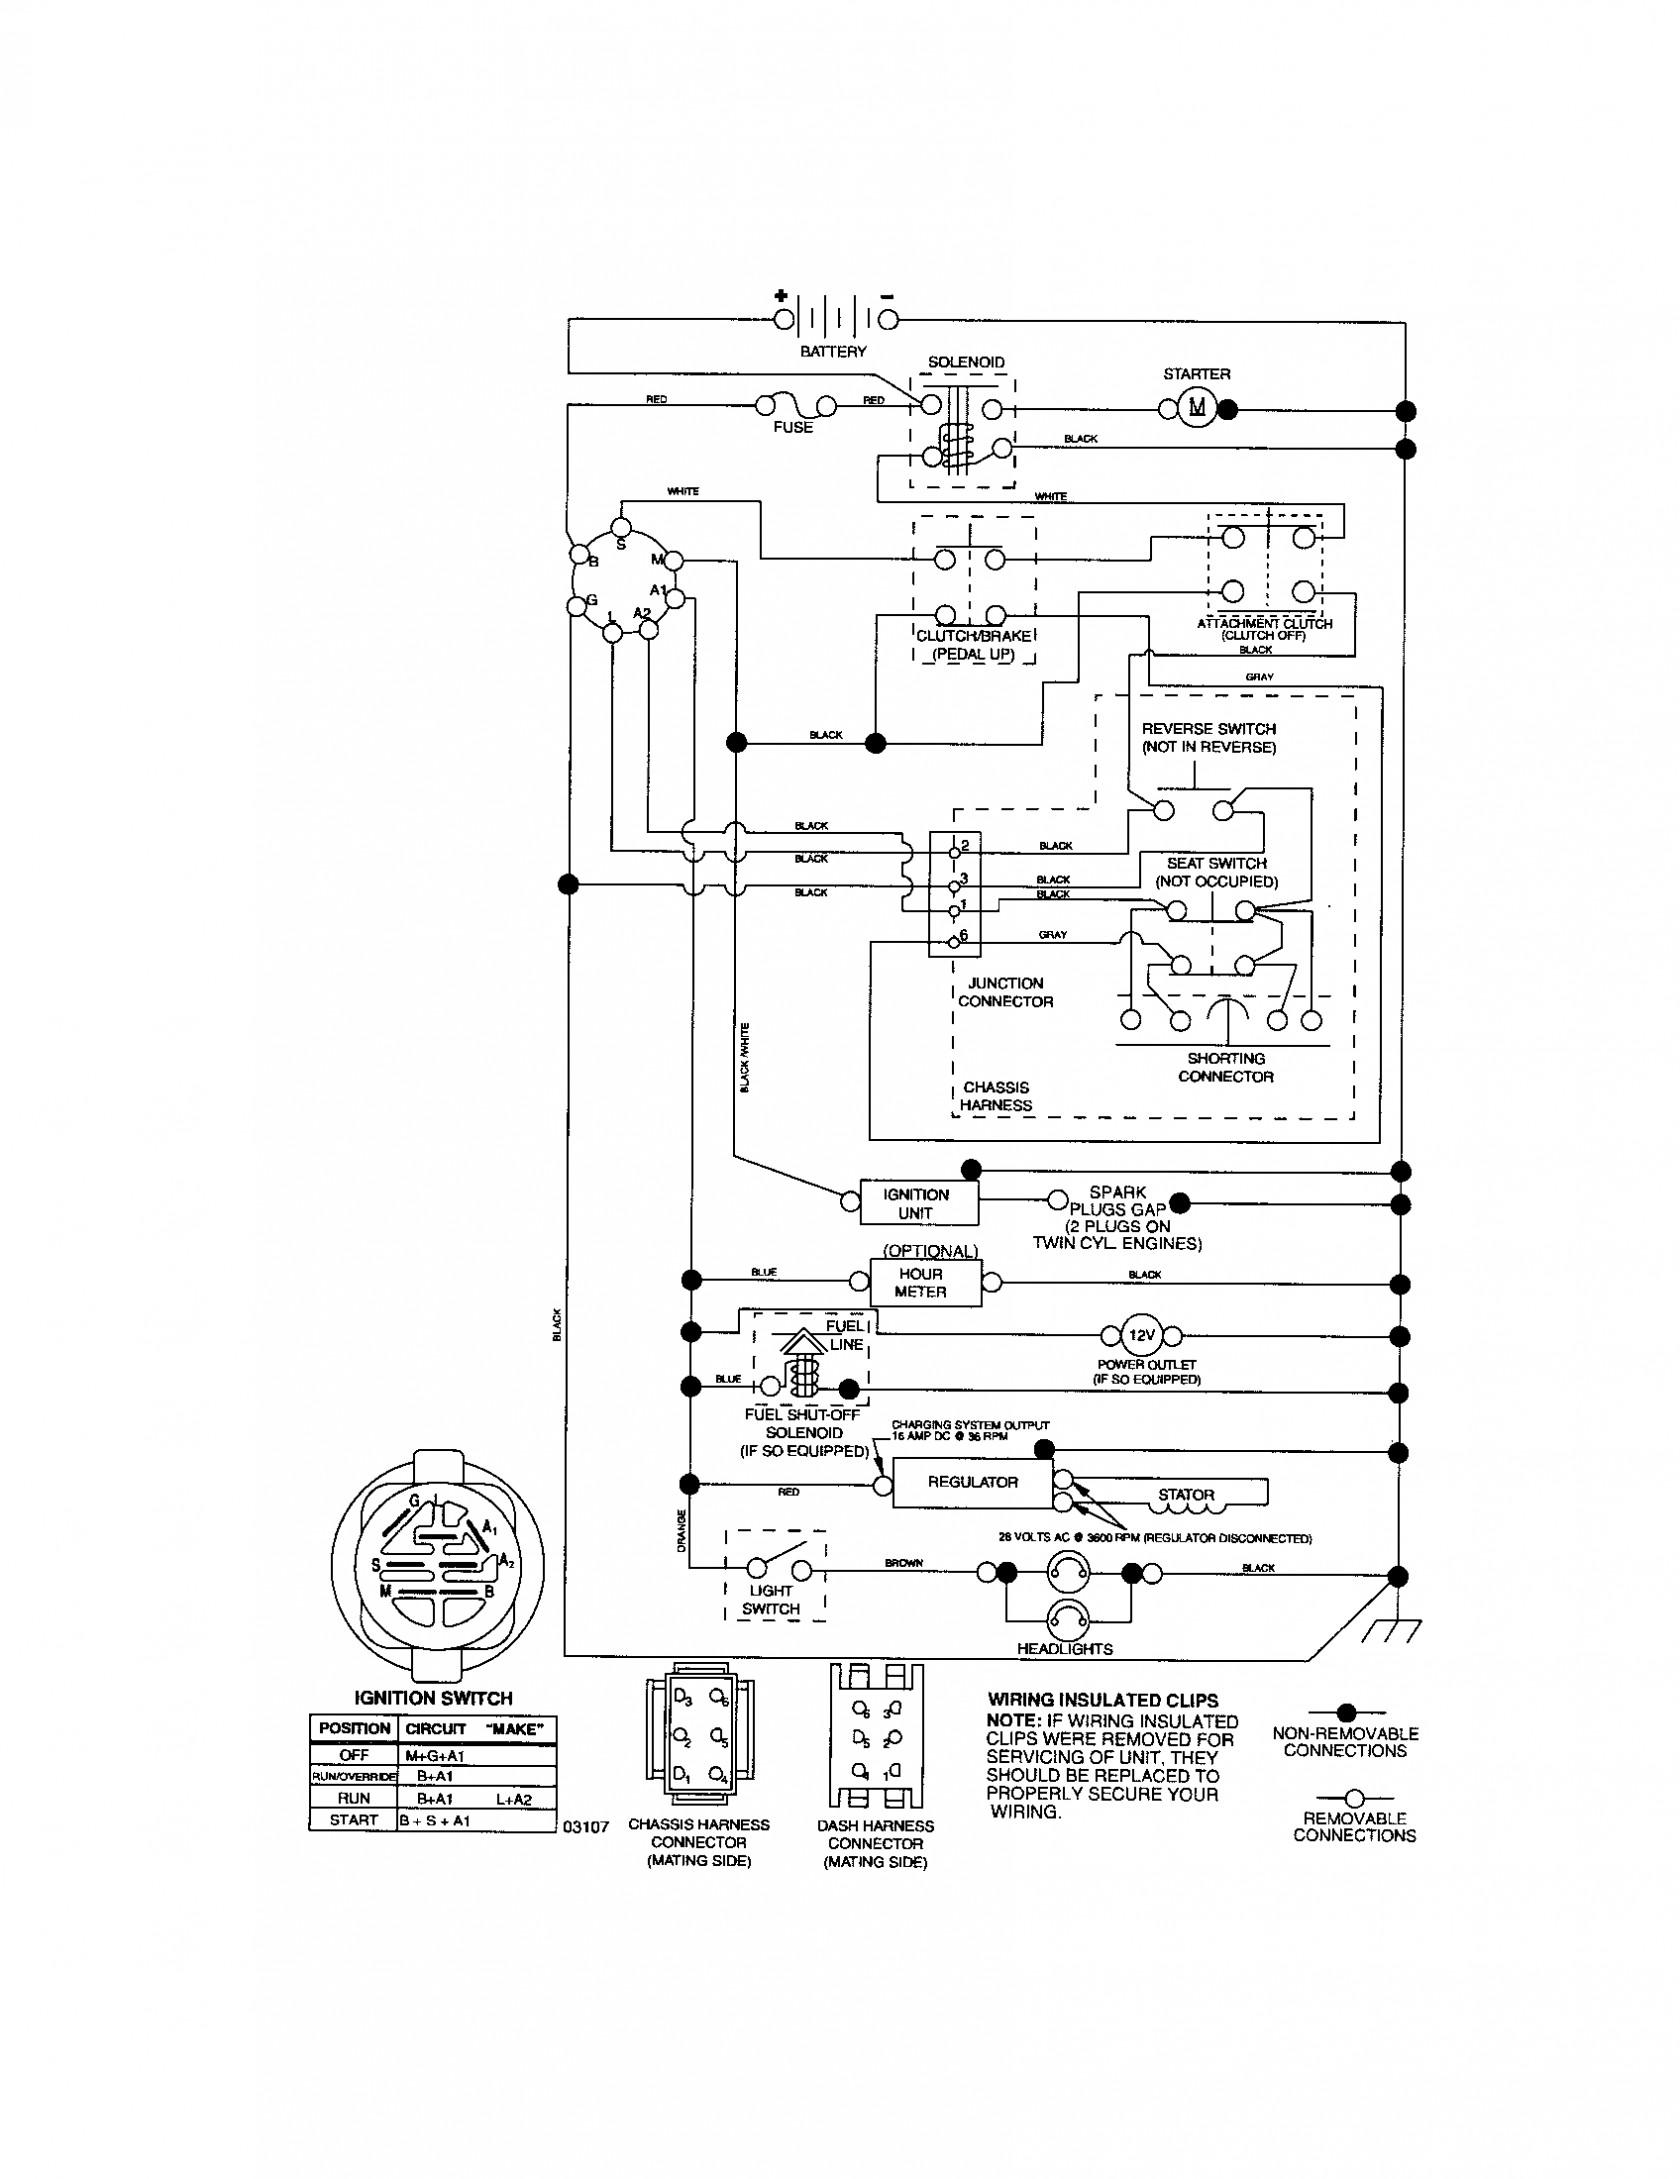 Electric Lawn Mower Wiring Diagram Start Wolf Toro Black And Decker 1680